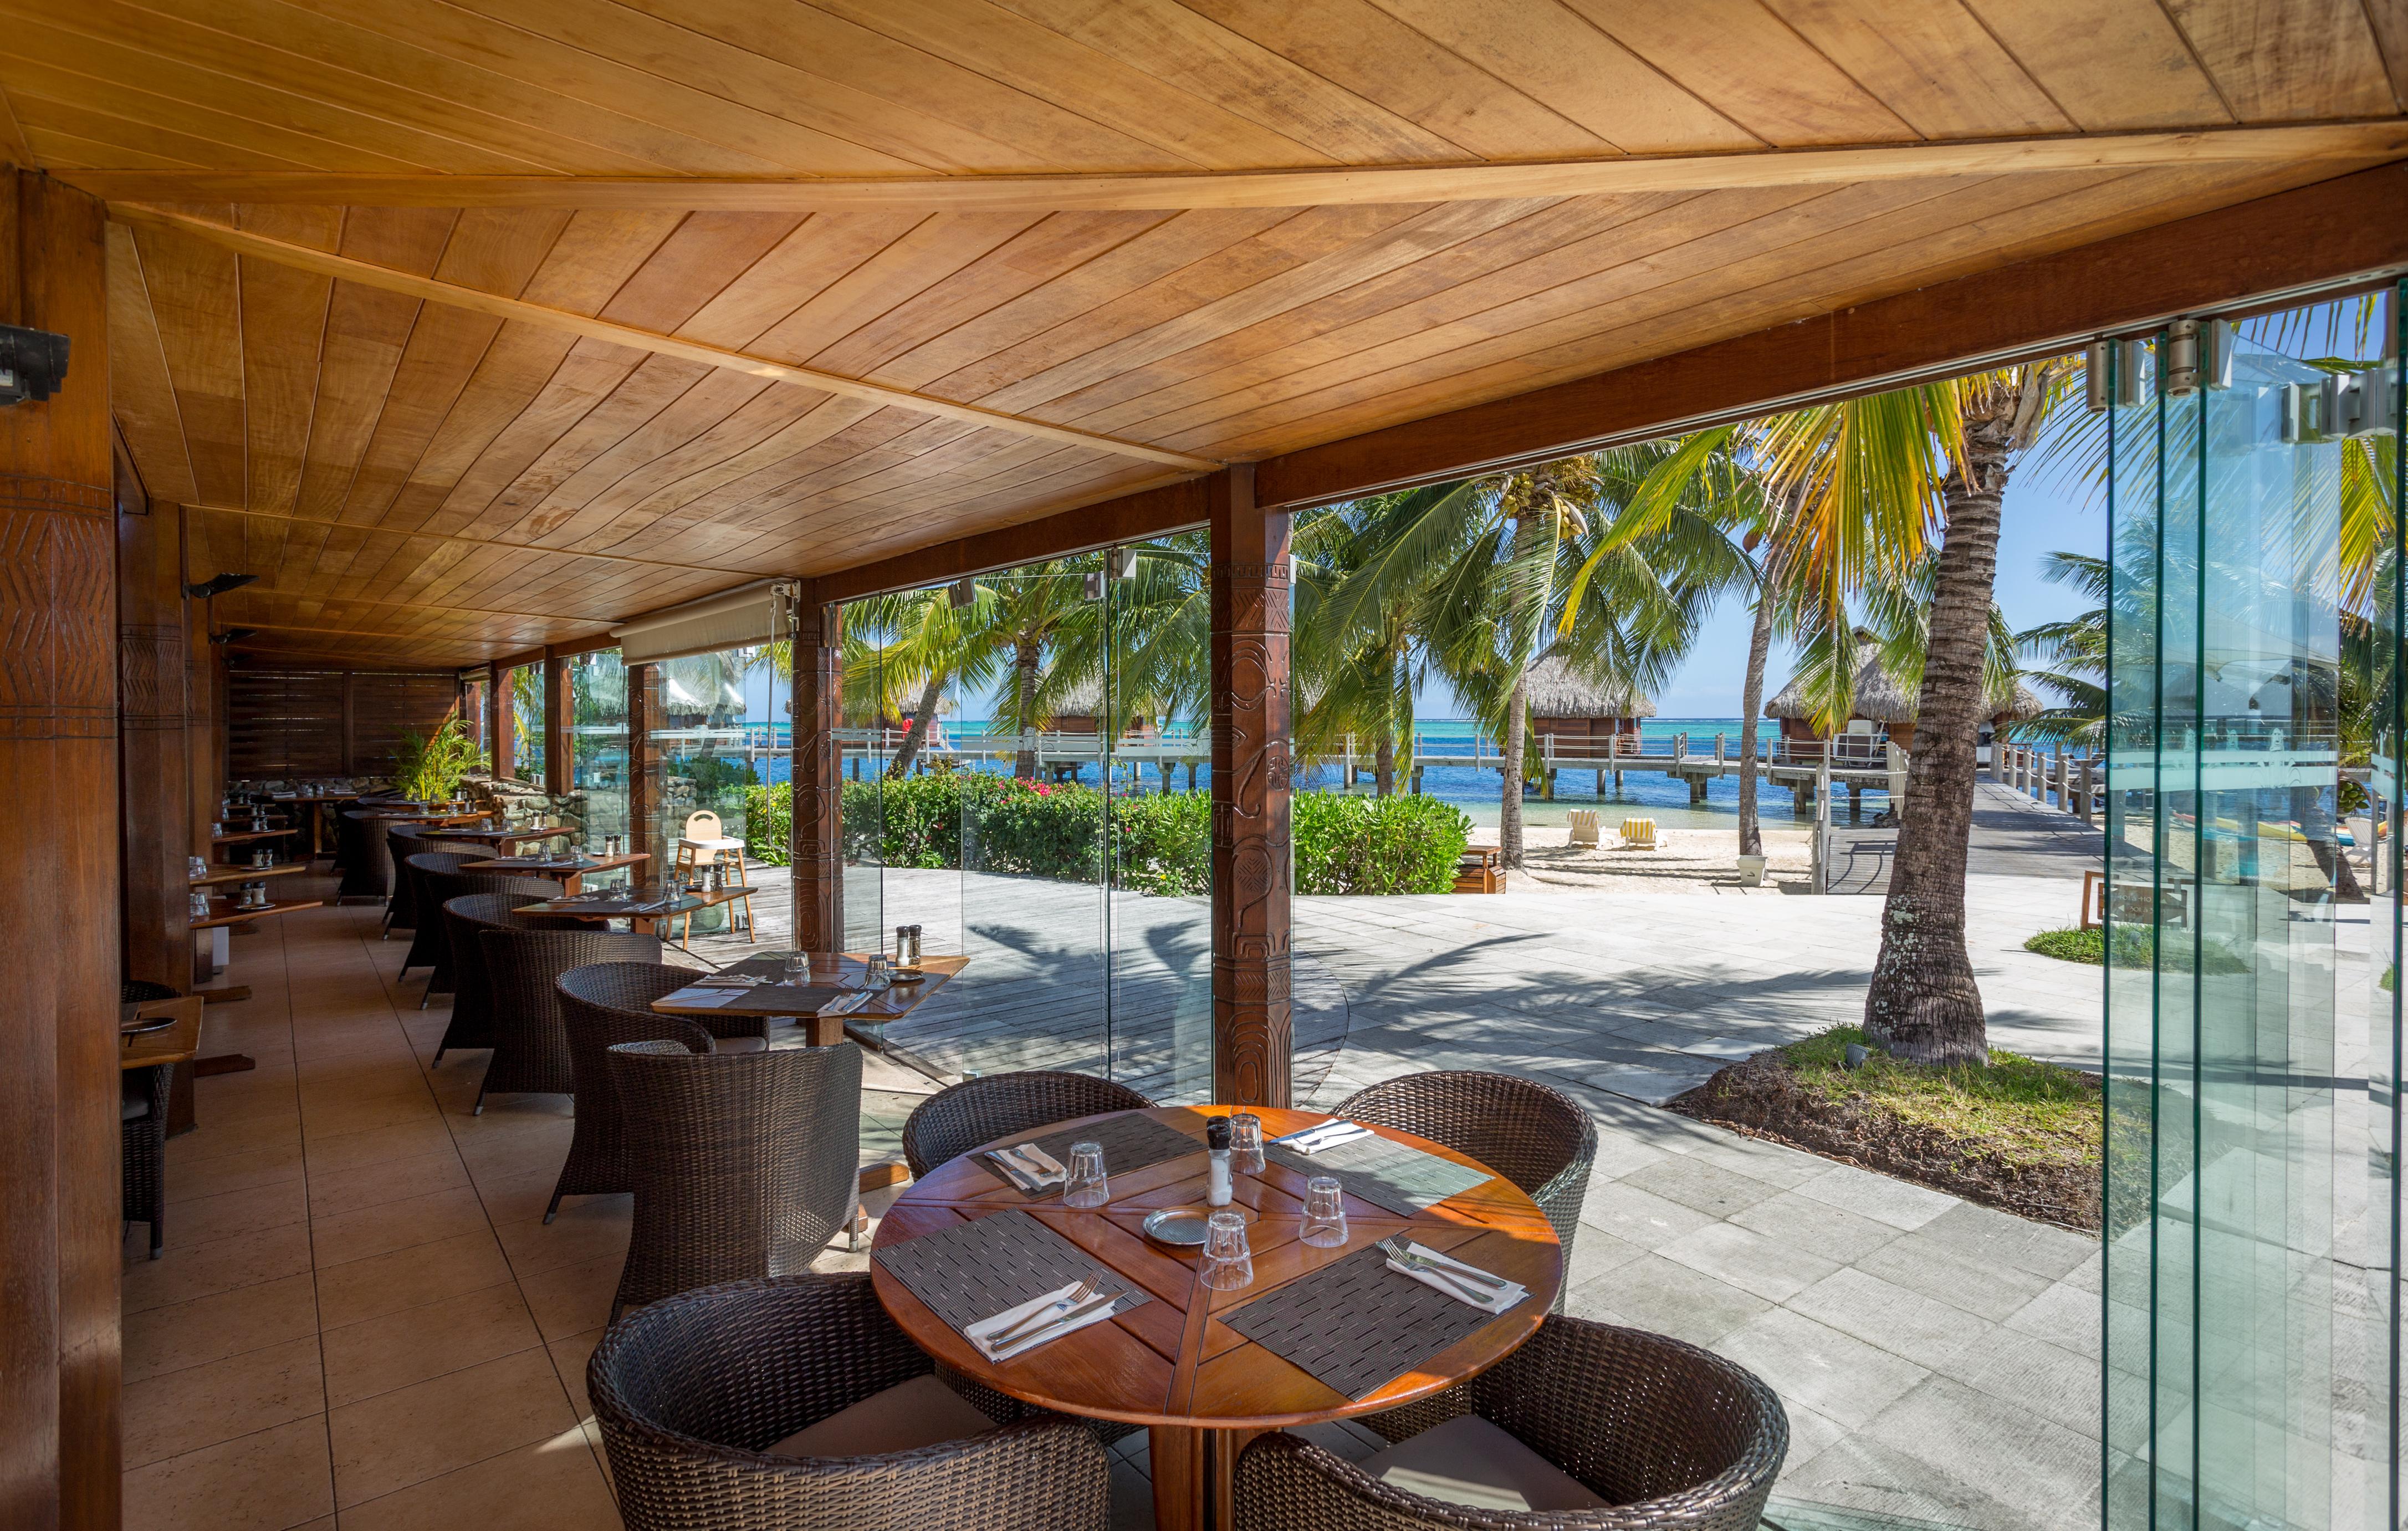 https://tahititourisme.de/wp-content/uploads/2018/03/RESTAURATION-Restaurant-Mahanai-1-Charles_Veronese.jpg